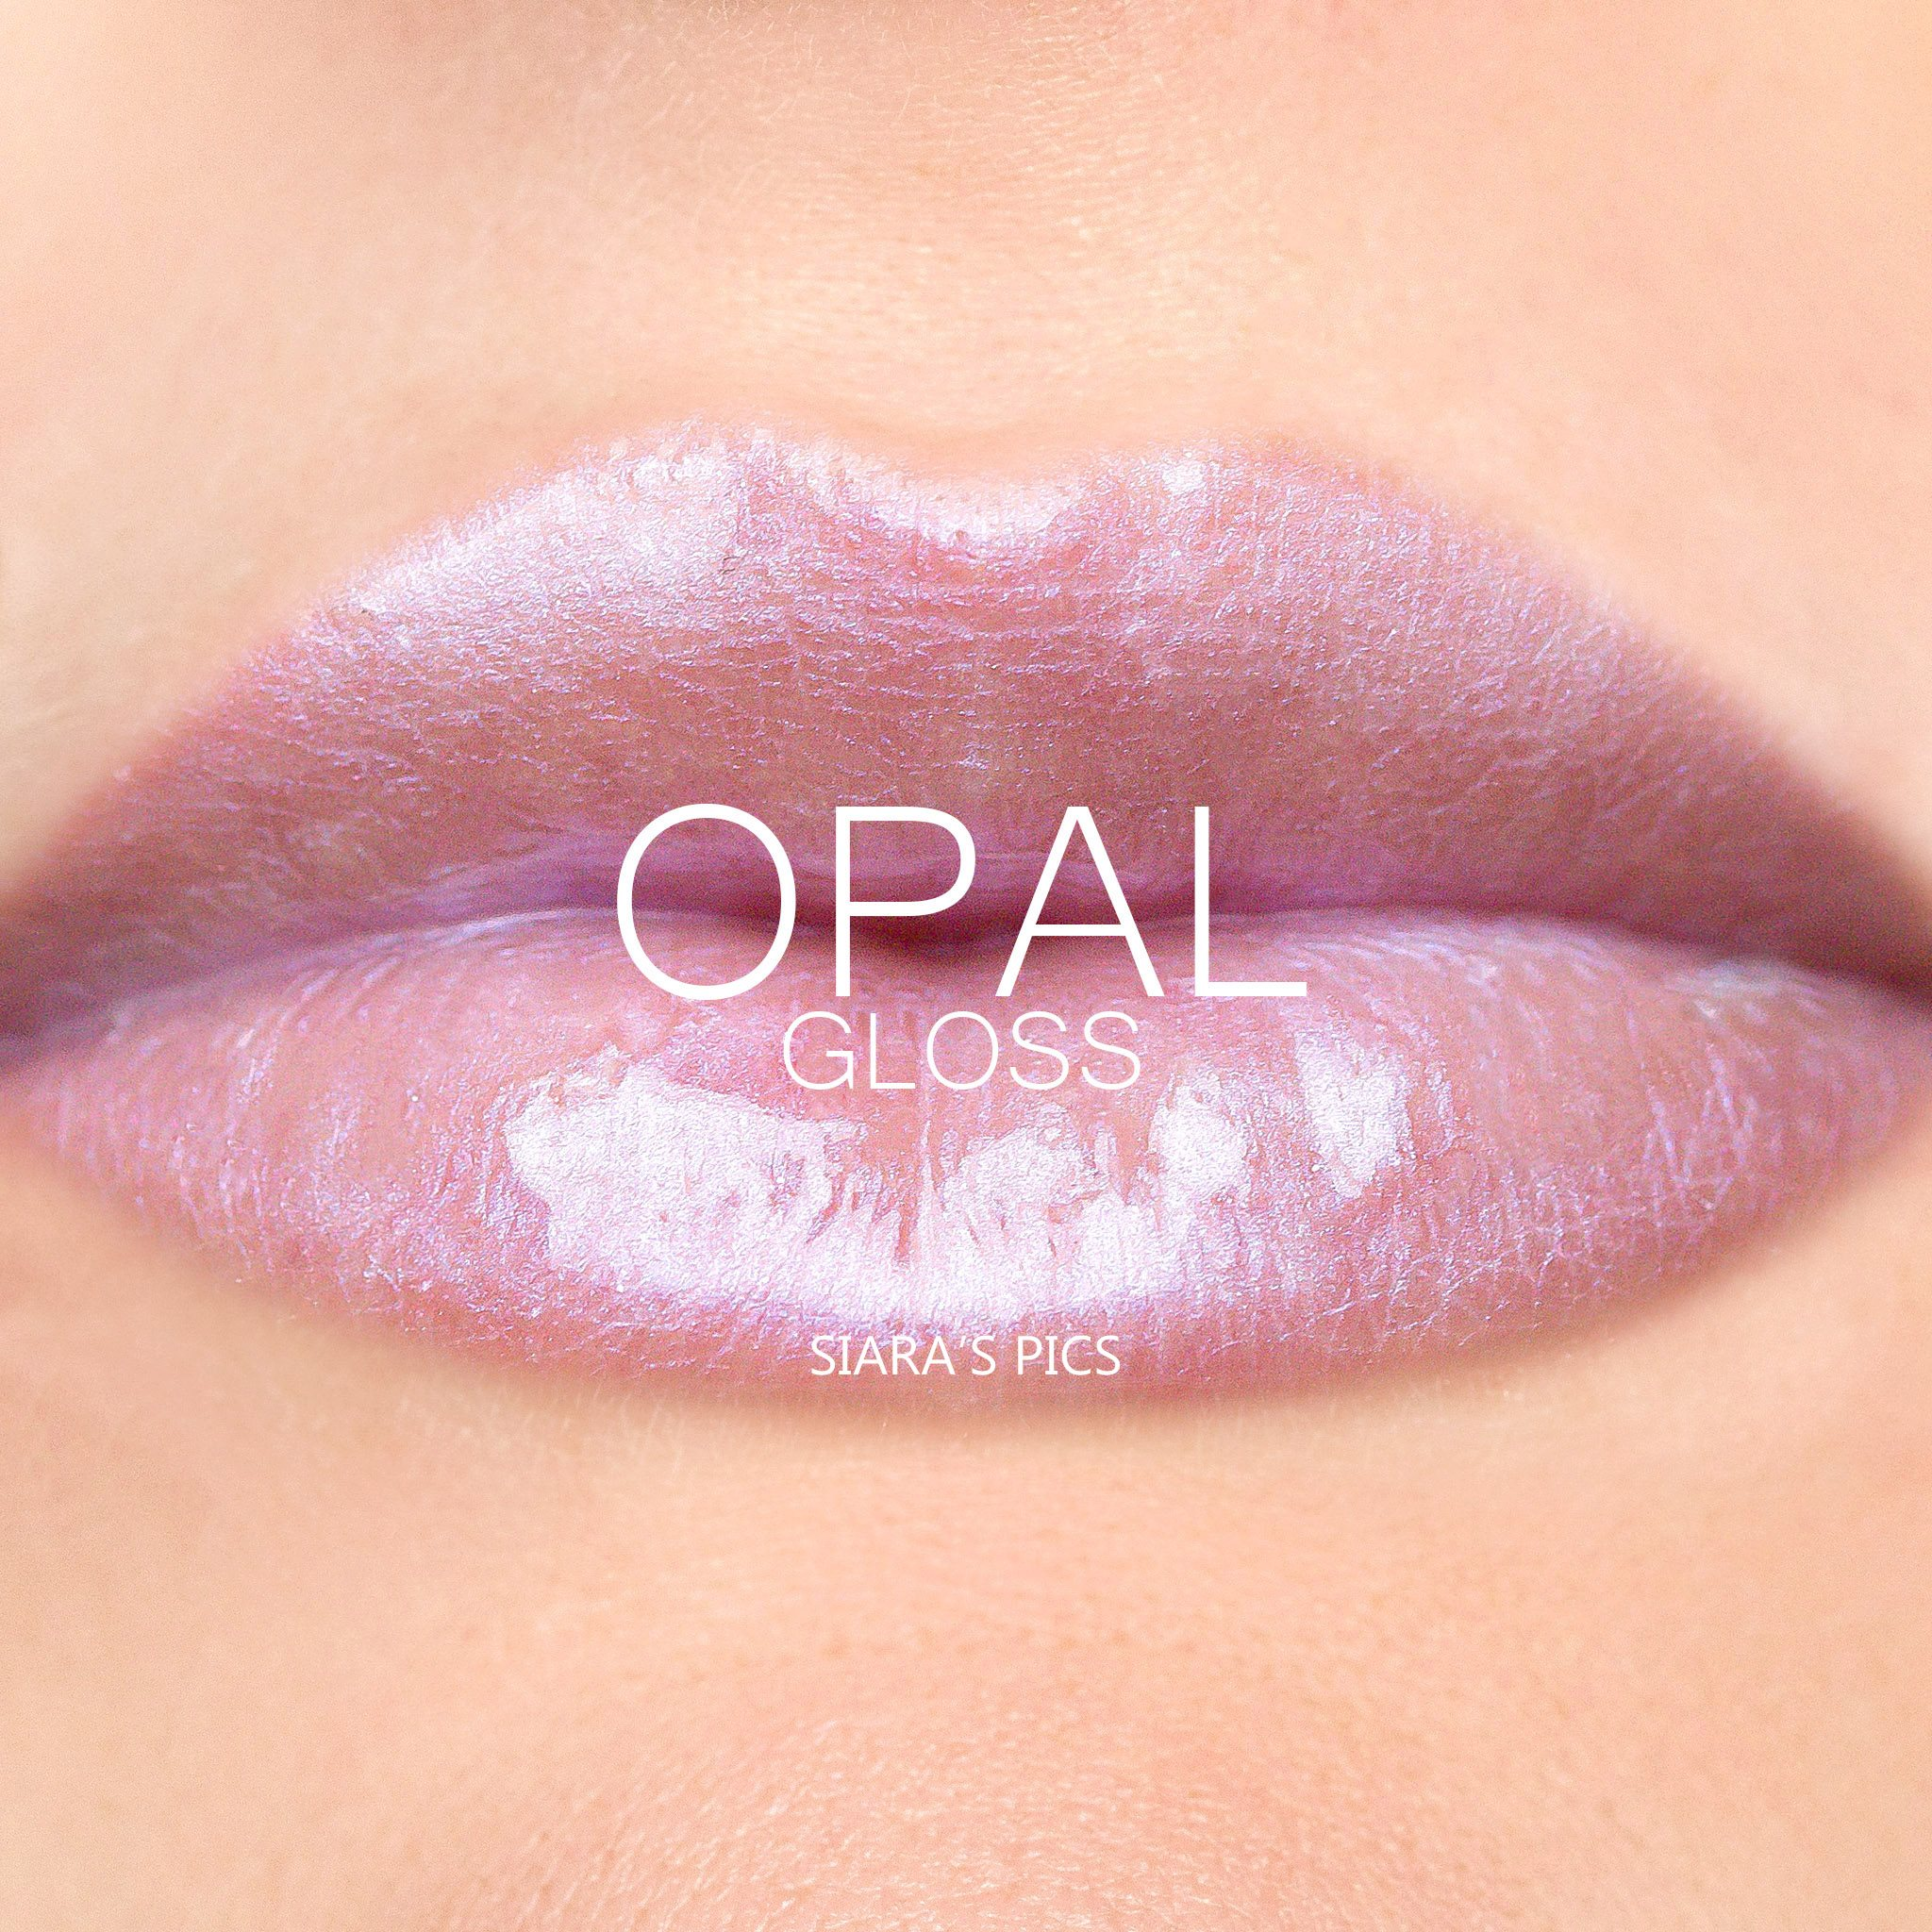 Opal Gloss.jpg